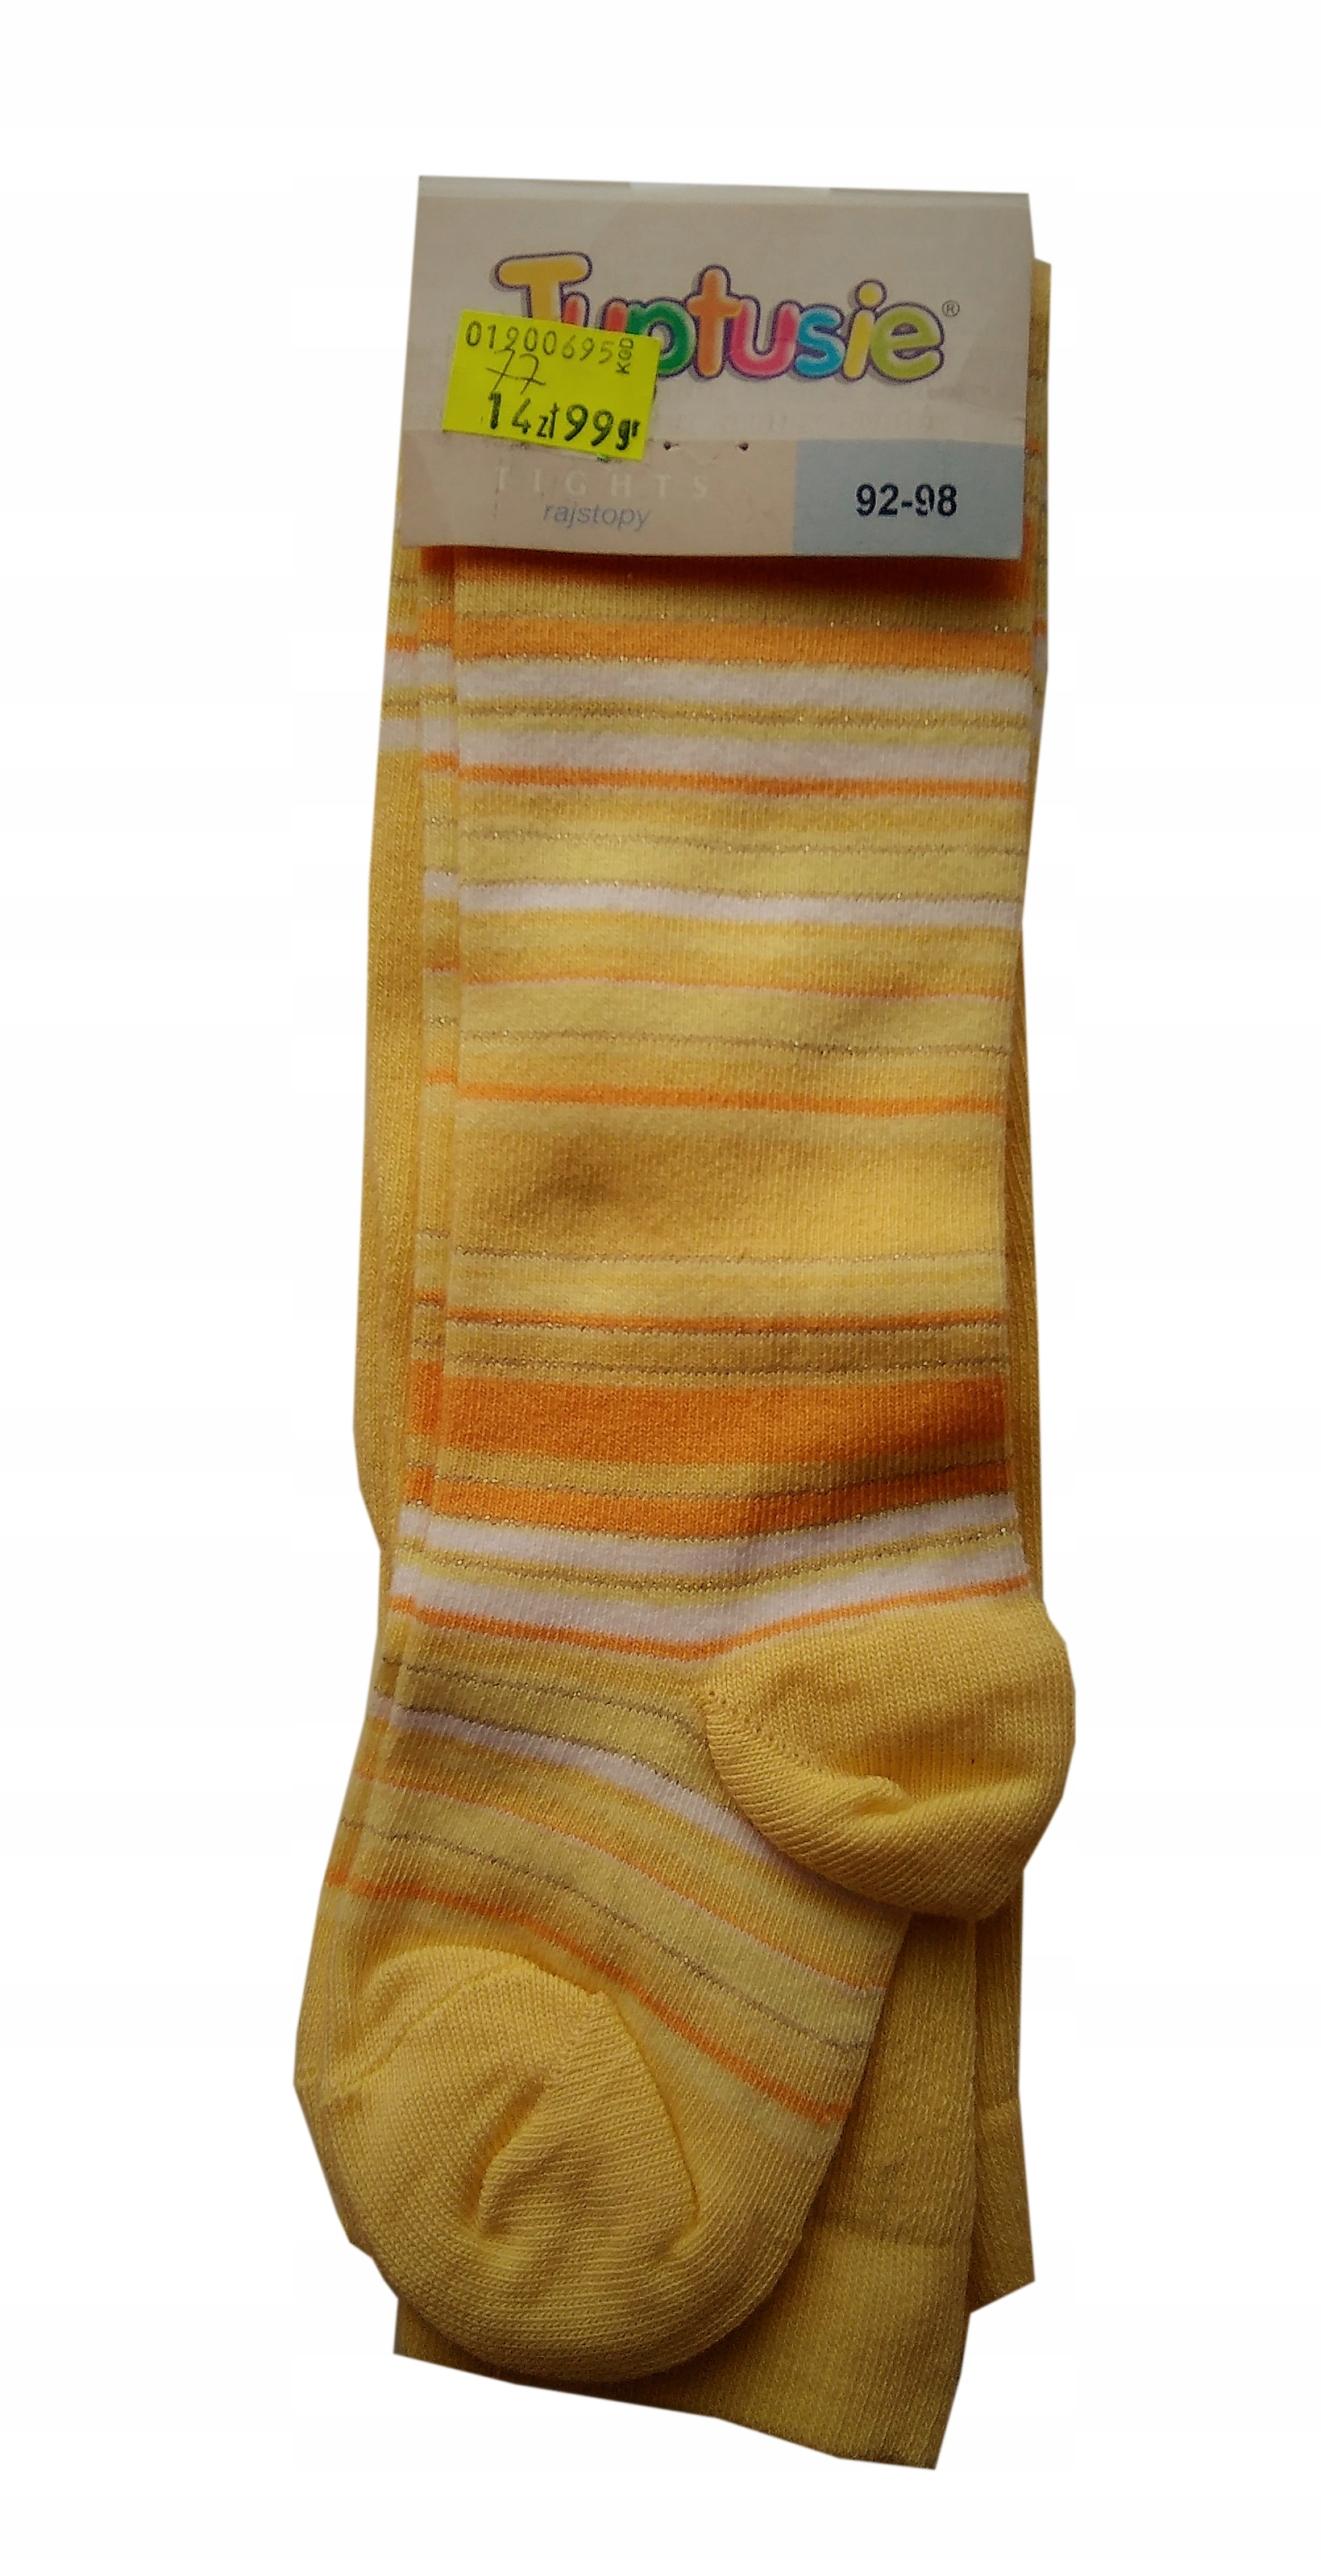 e0fa19f4afe90d rajstopy tuptusie w Oficjalnym Archiwum Allegro - archiwum ofert